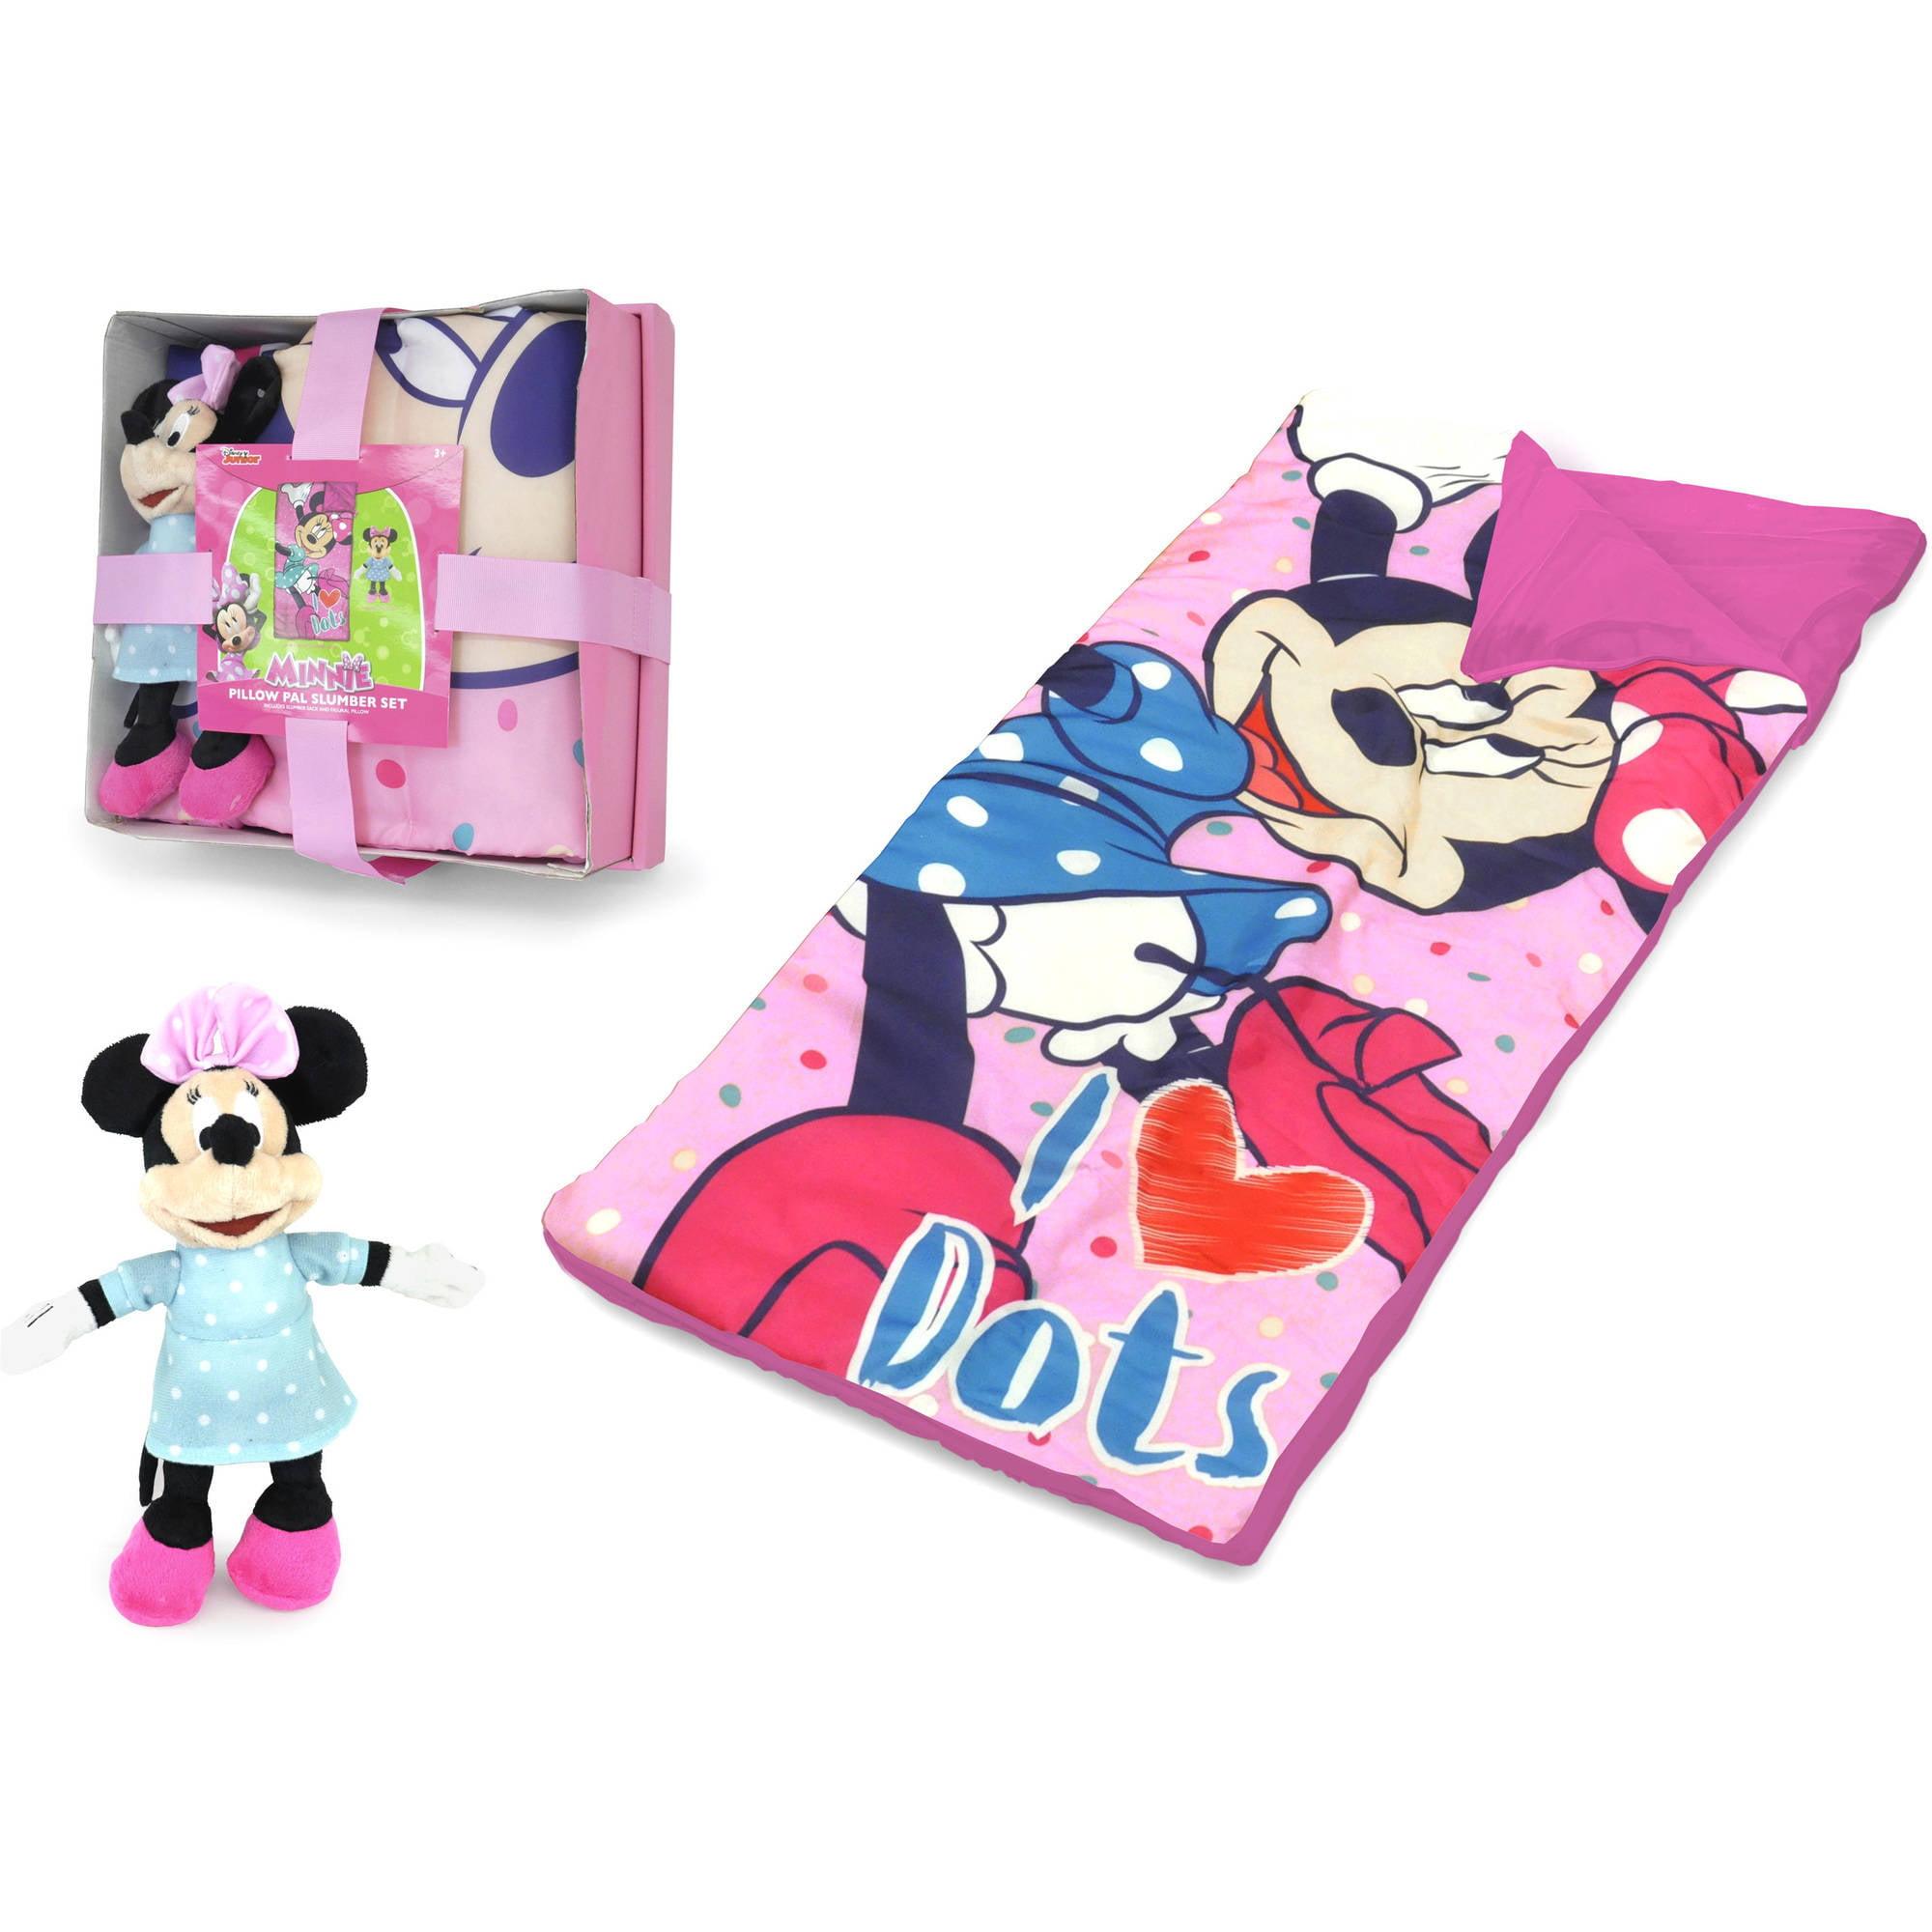 Disney Minnie Mouse Nap Mat with Bonus Figural Pillow by Idea Nuova